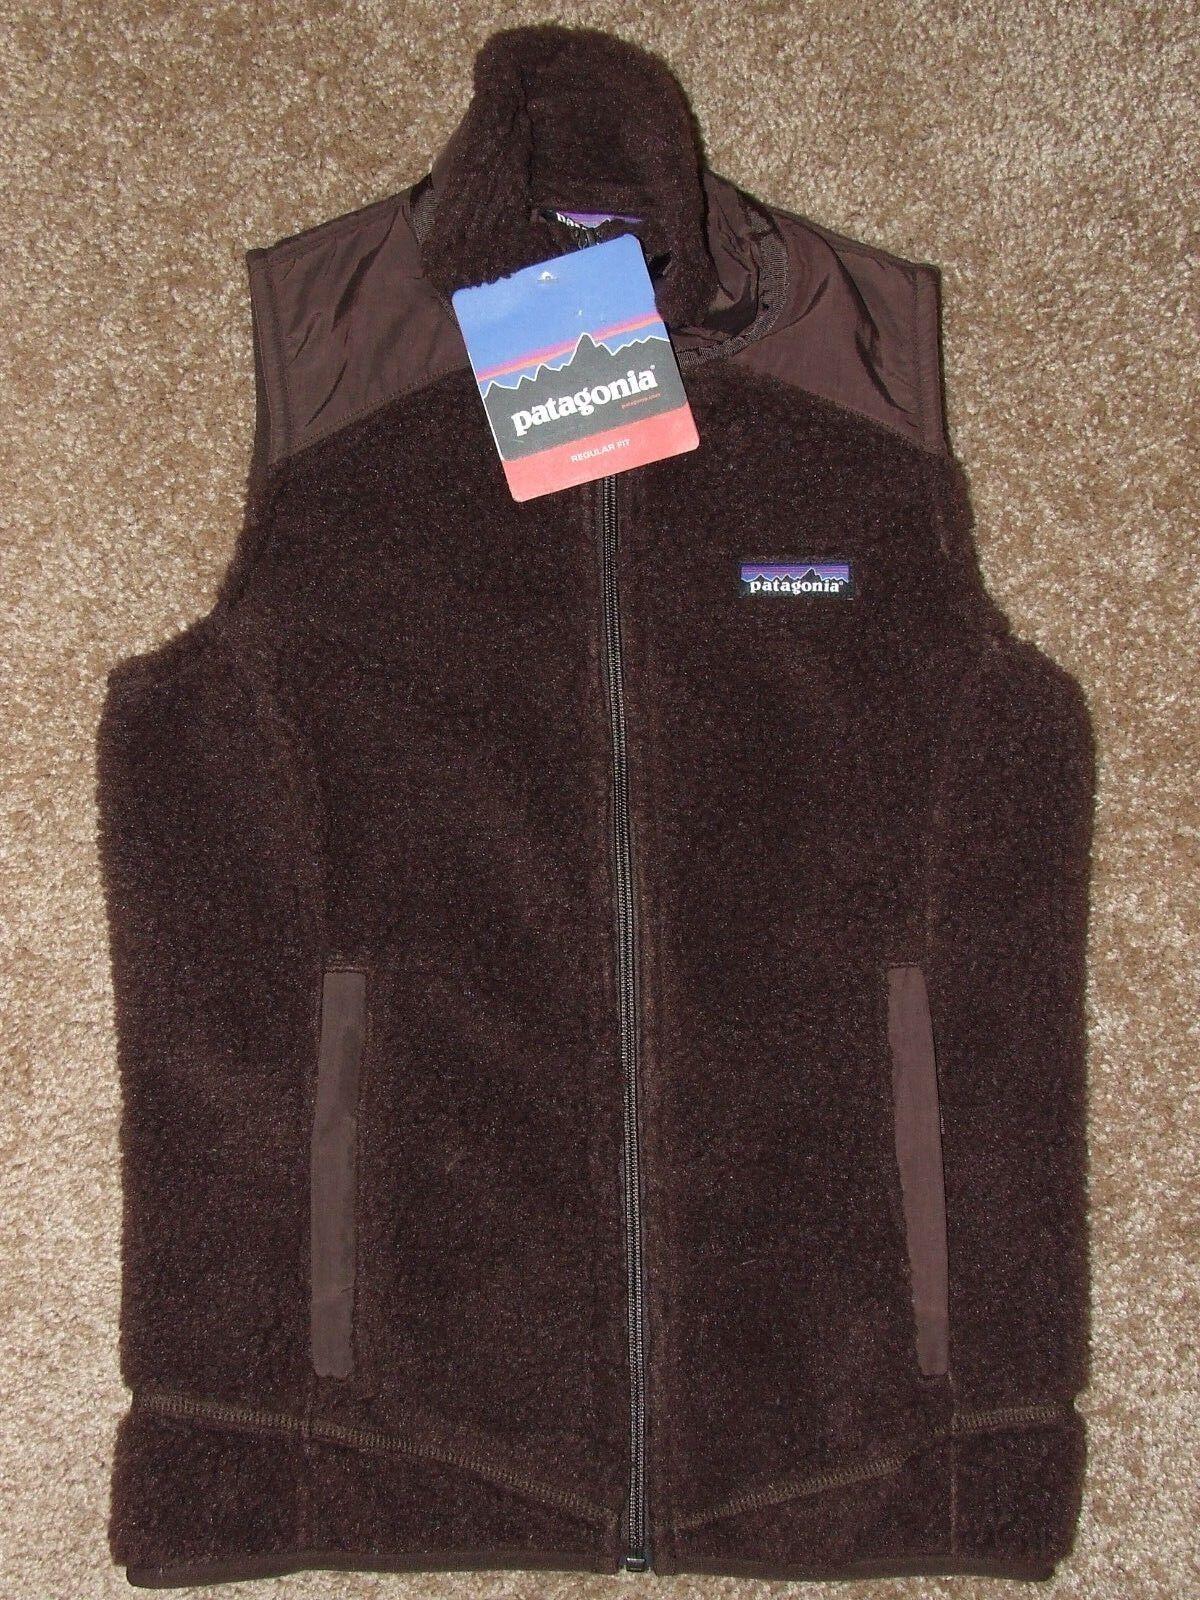 New  Patagonia Women's Classic Retro-X Fleece Pile Vest XS Java Brown